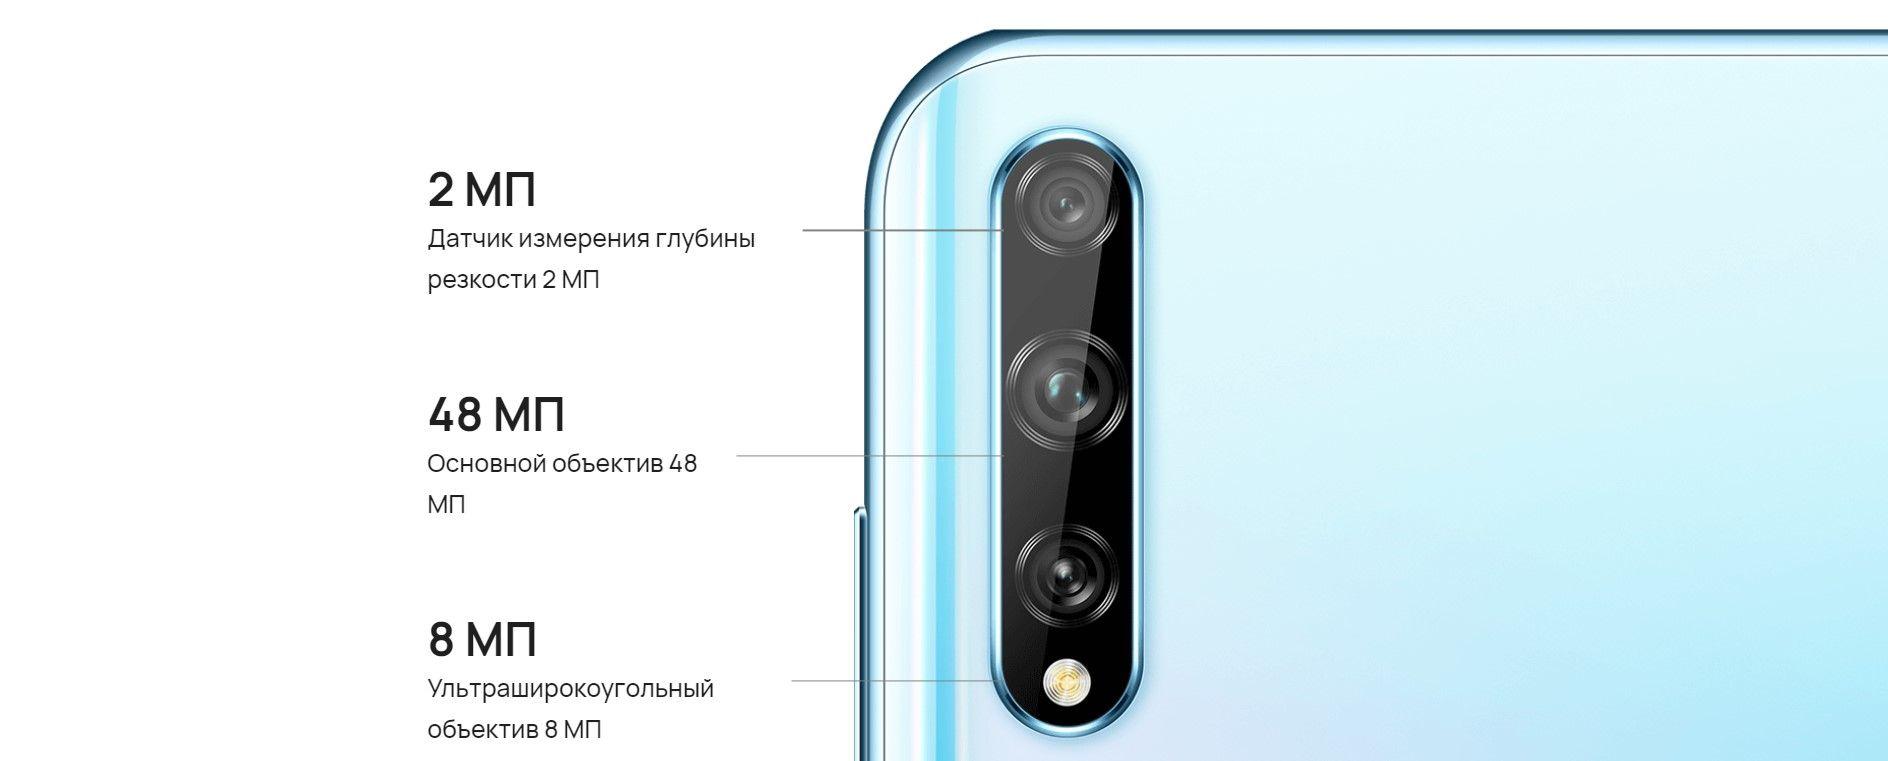 Huawei Y8p основная камера